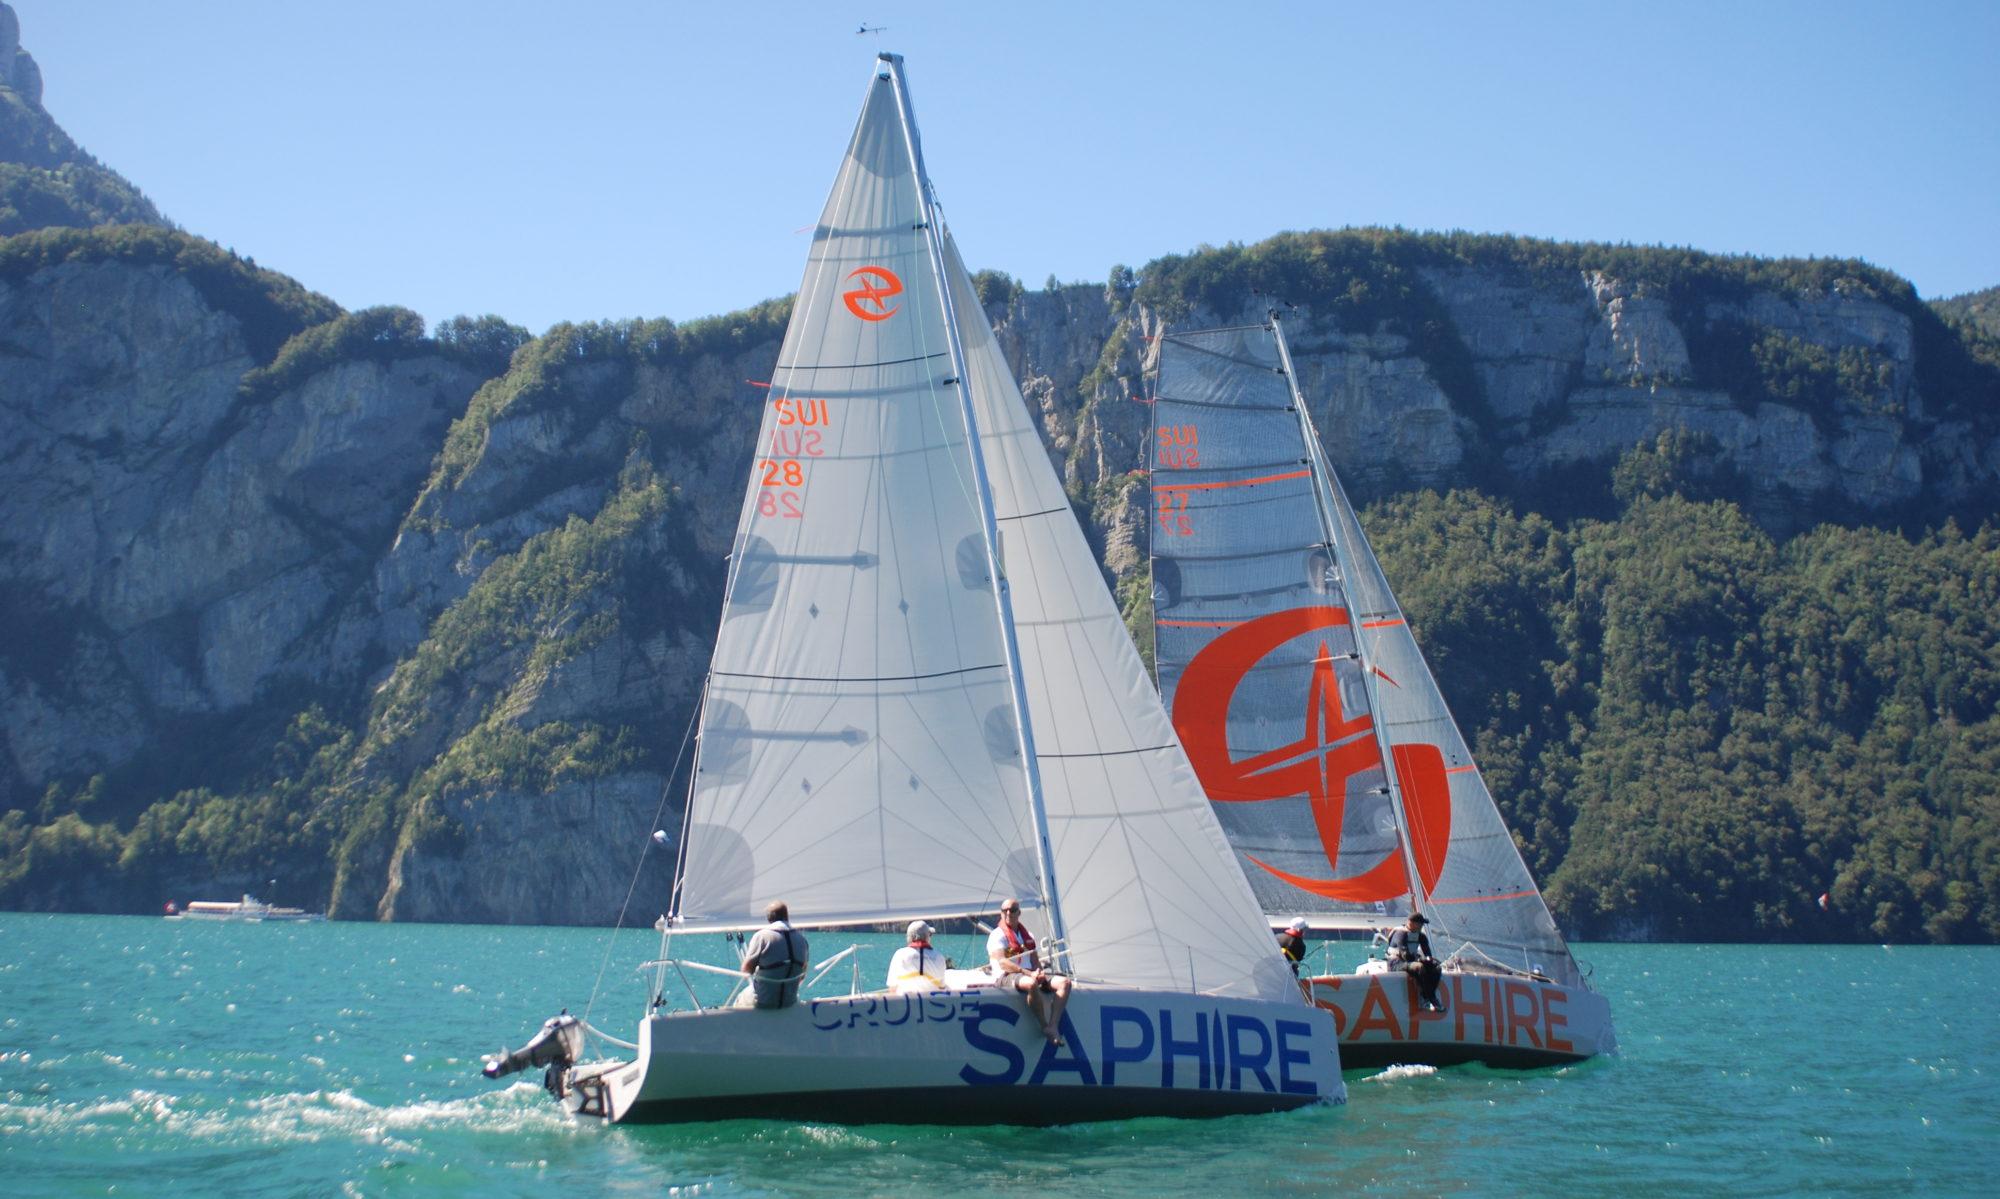 Saphire 27 Class Association - SCA